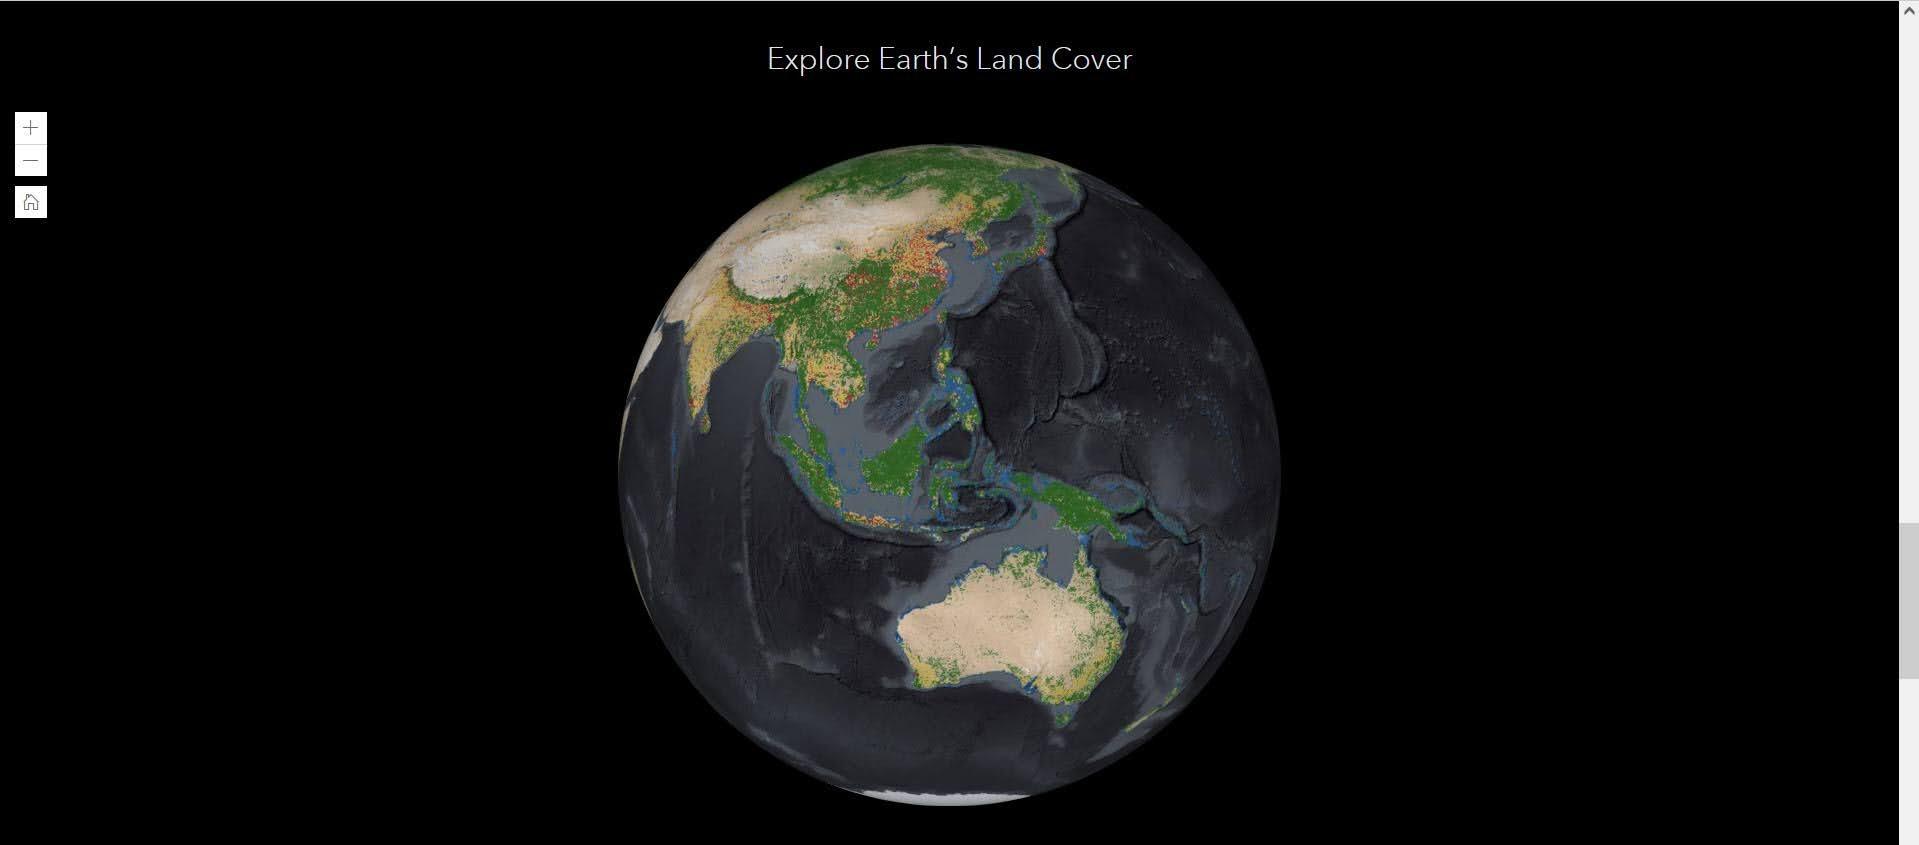 Komparasi Peta Tutupan Lahan ESRI 2020 dan Versi KLHK